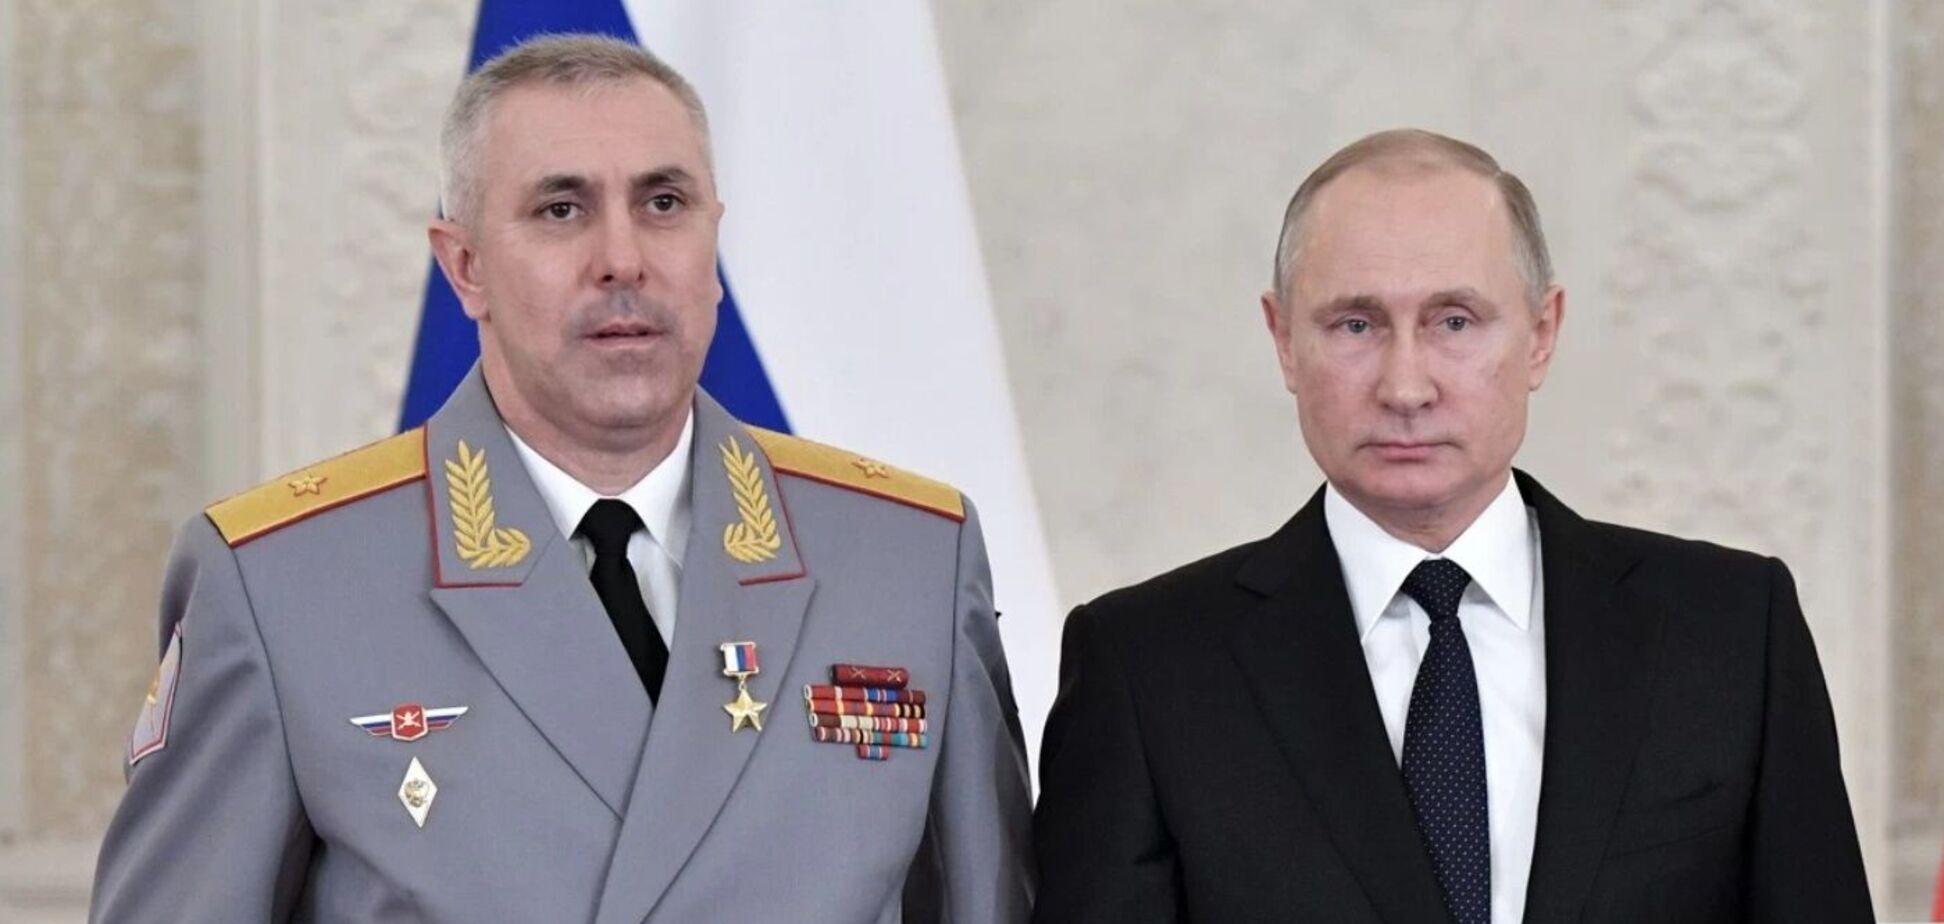 Рустам Мурадов с президентом РФ Владимиром Путиным